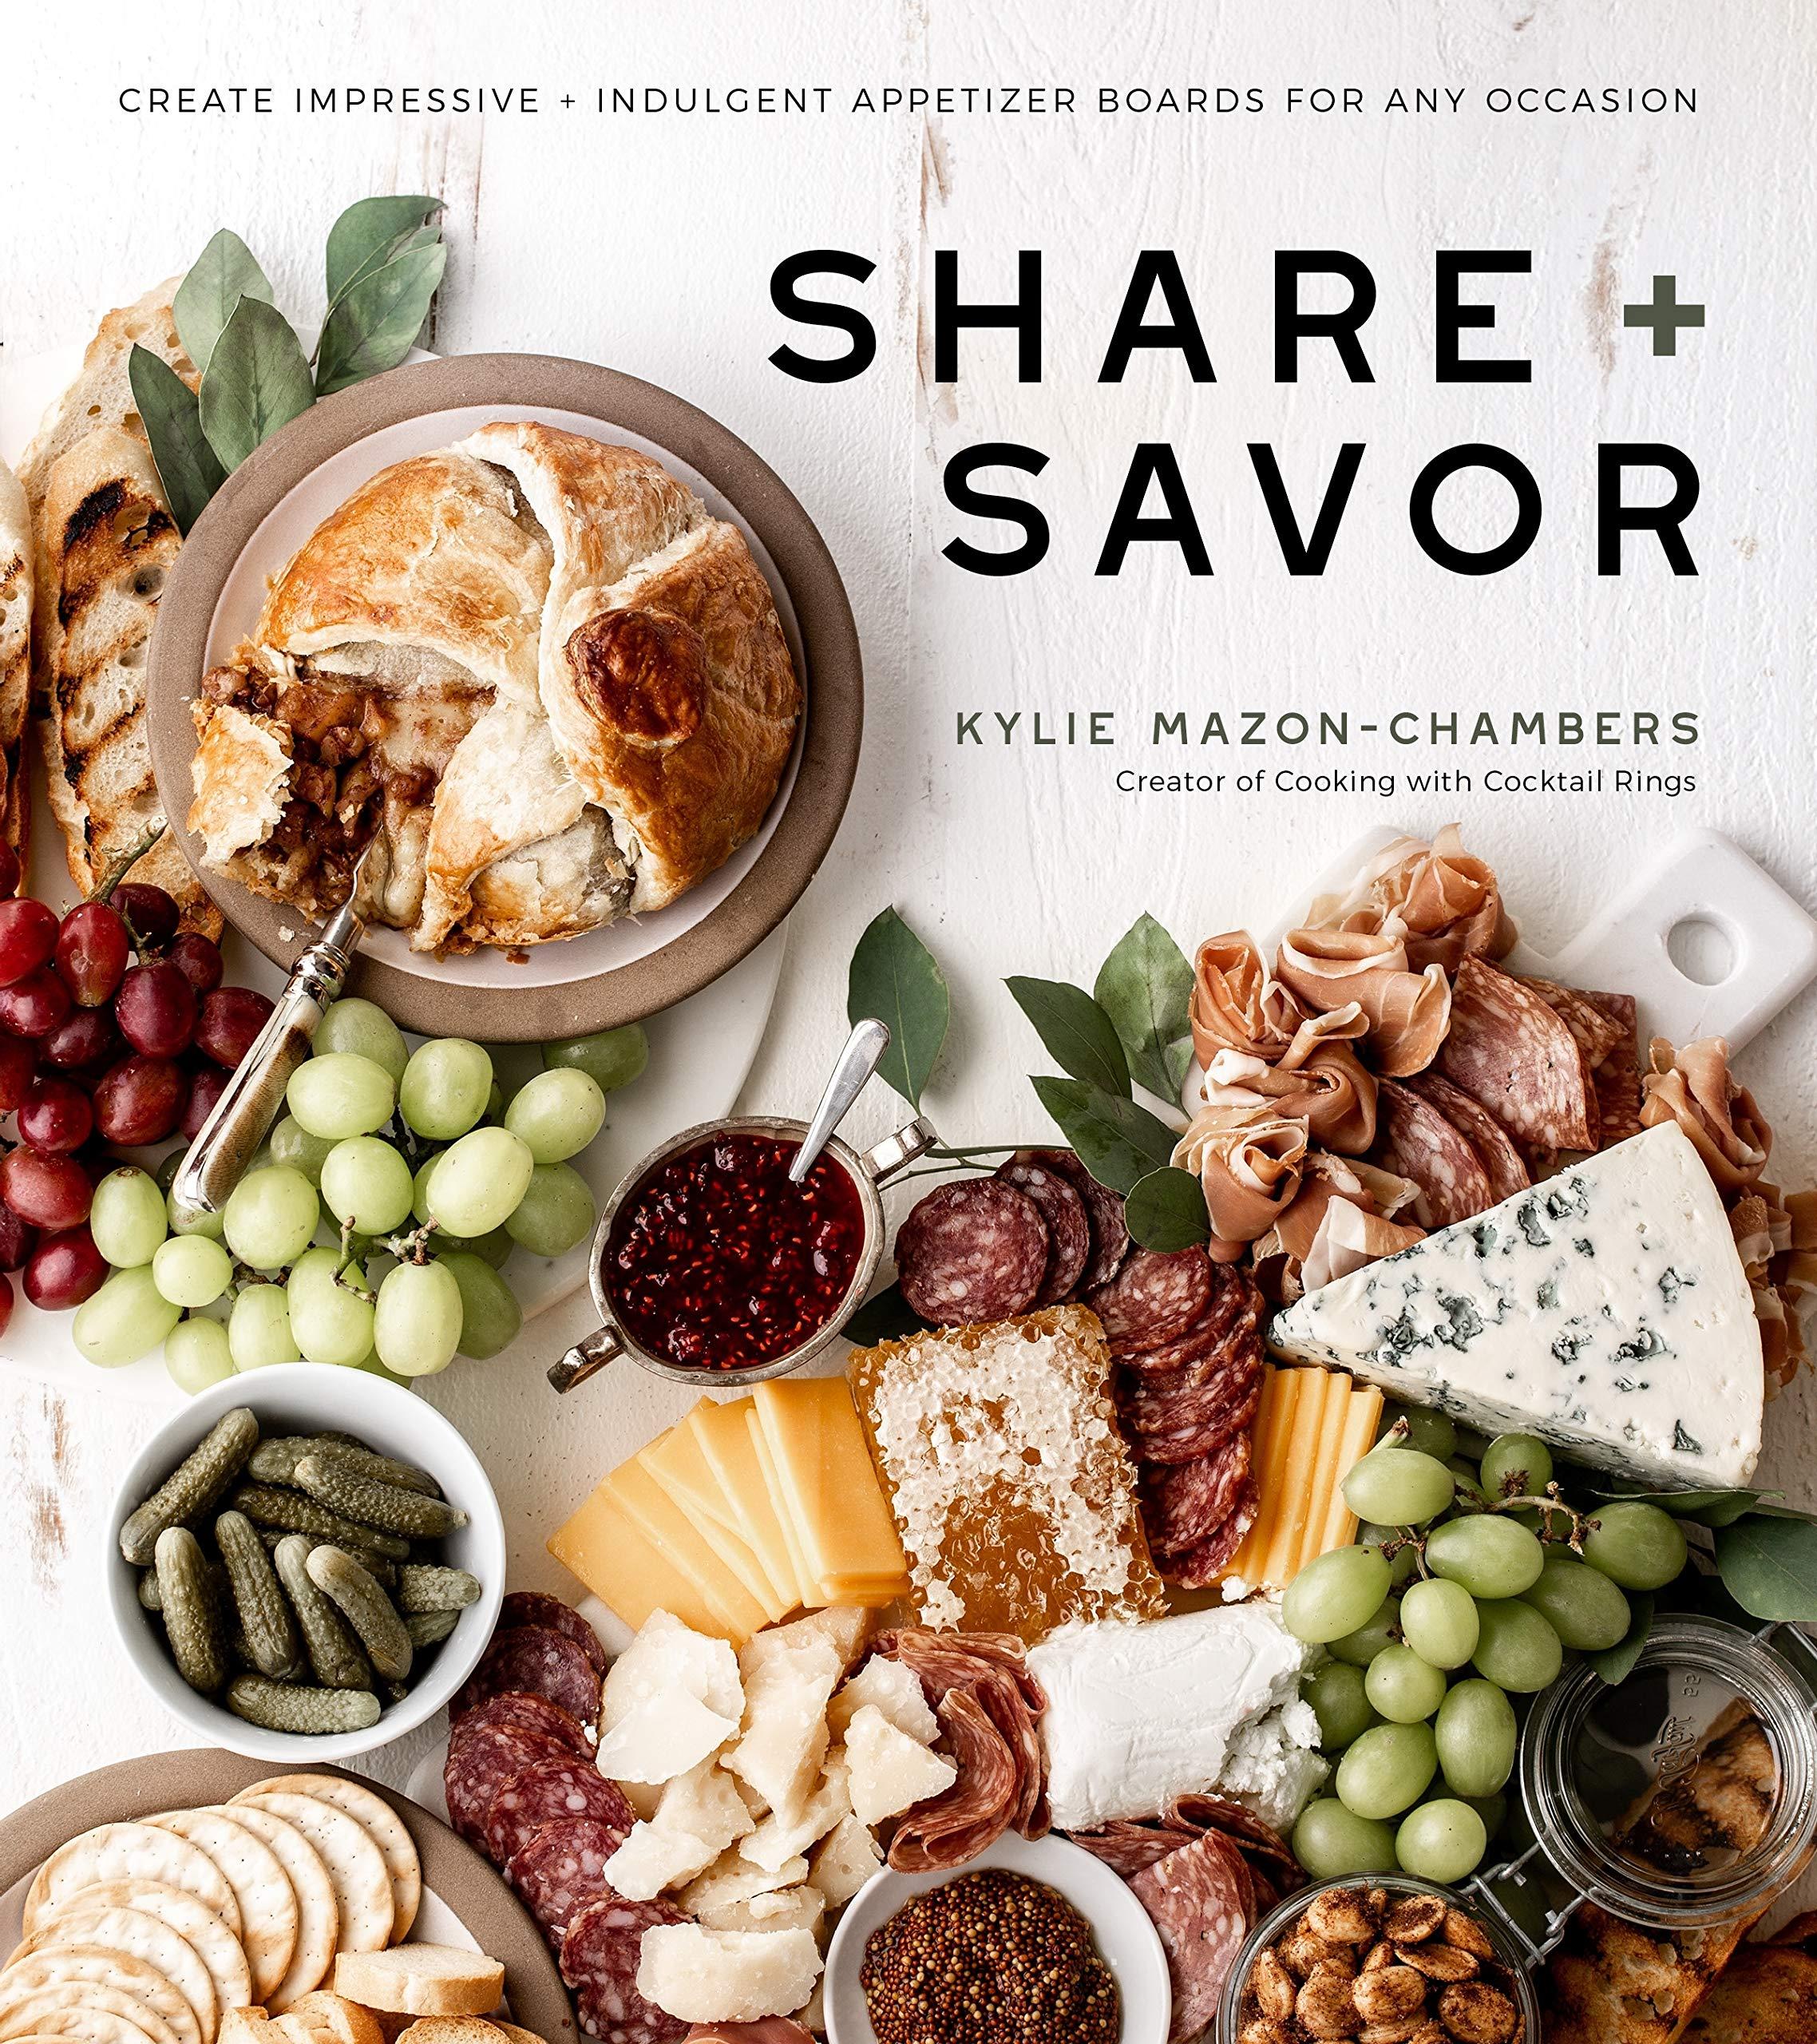 Share + Savor Create Impressive + Indulgent Appetizer Boards for ...